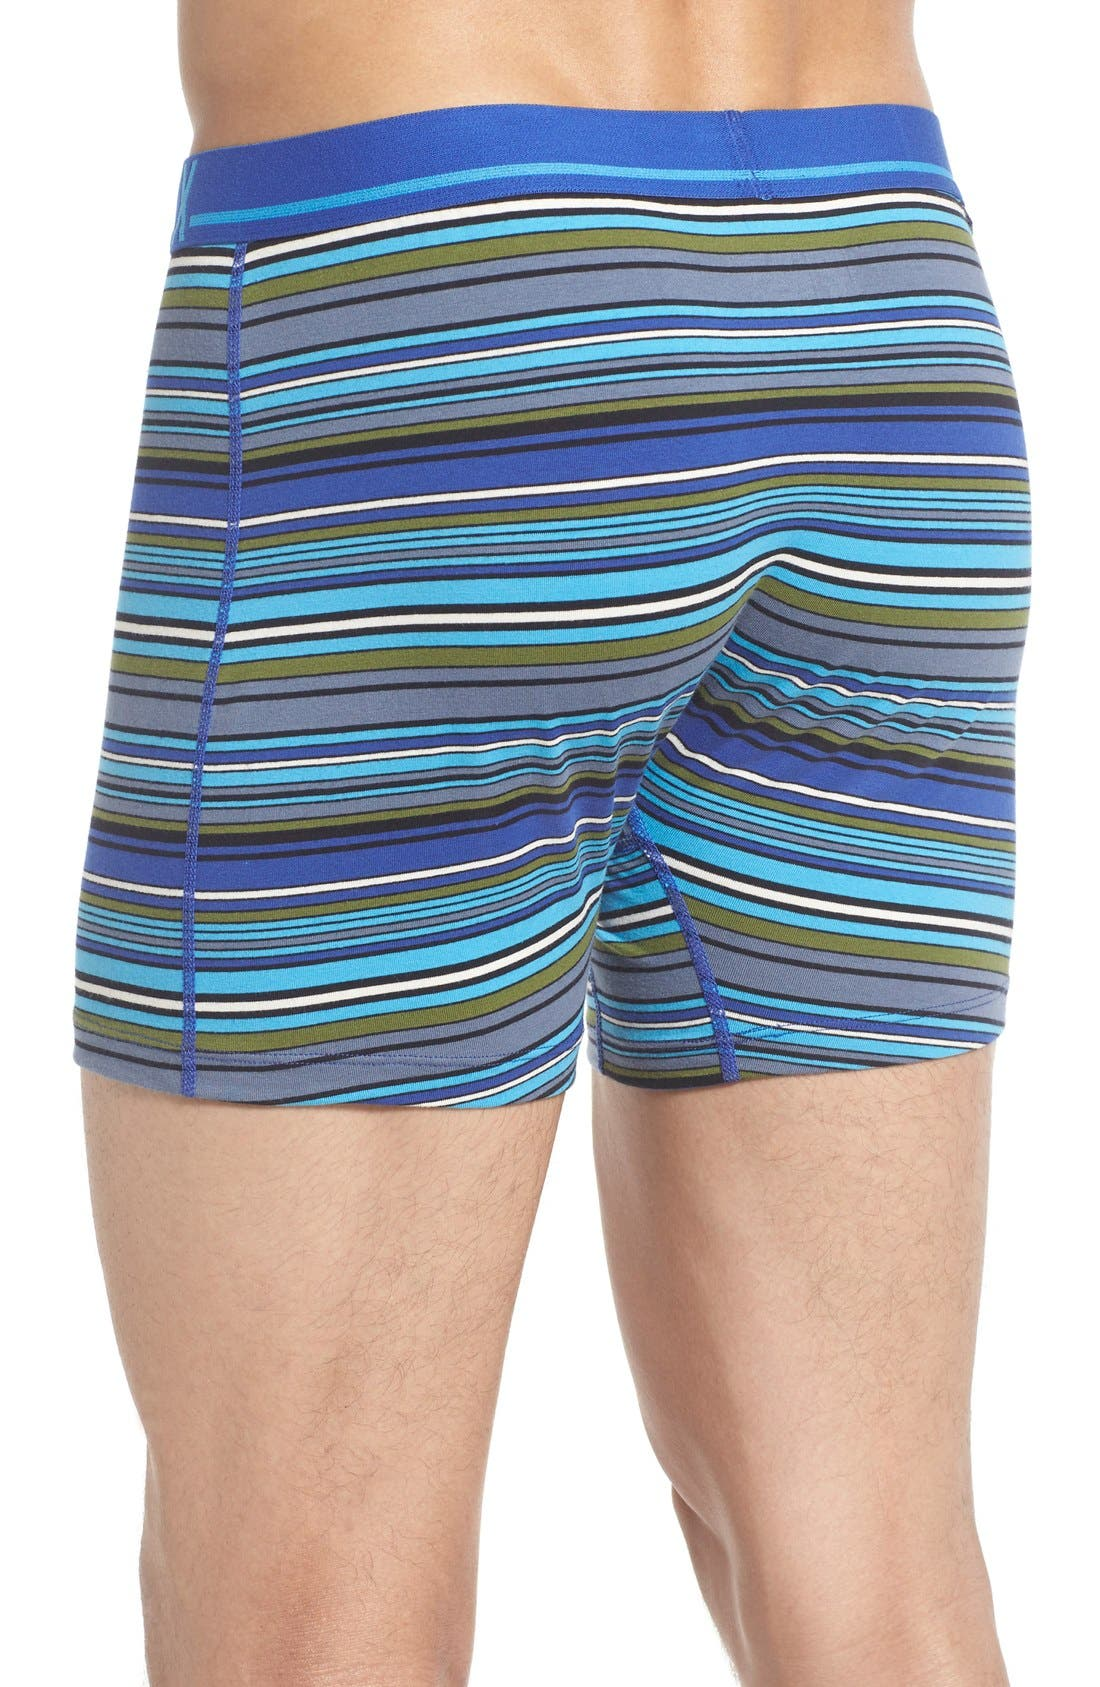 365 Boxer Briefs,                             Alternate thumbnail 3, color,                             Cobalt Blanket Stripe